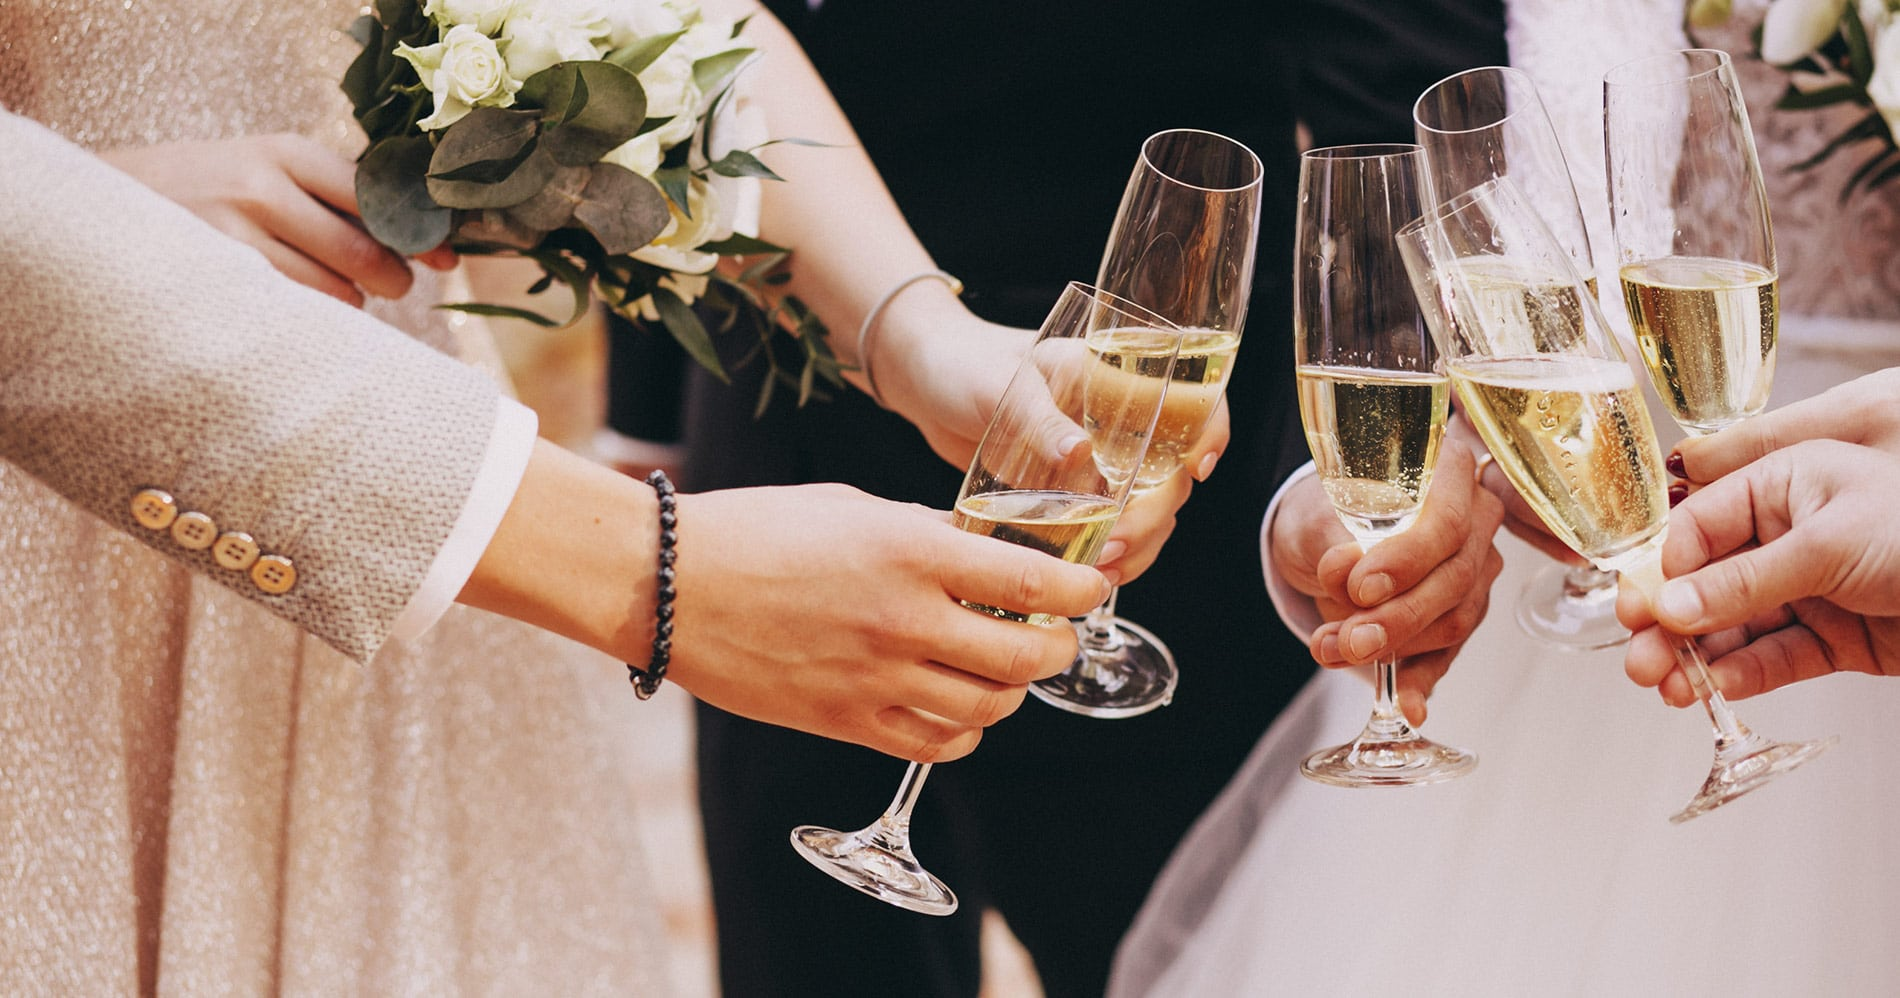 matrimonio: rinfresco in casa